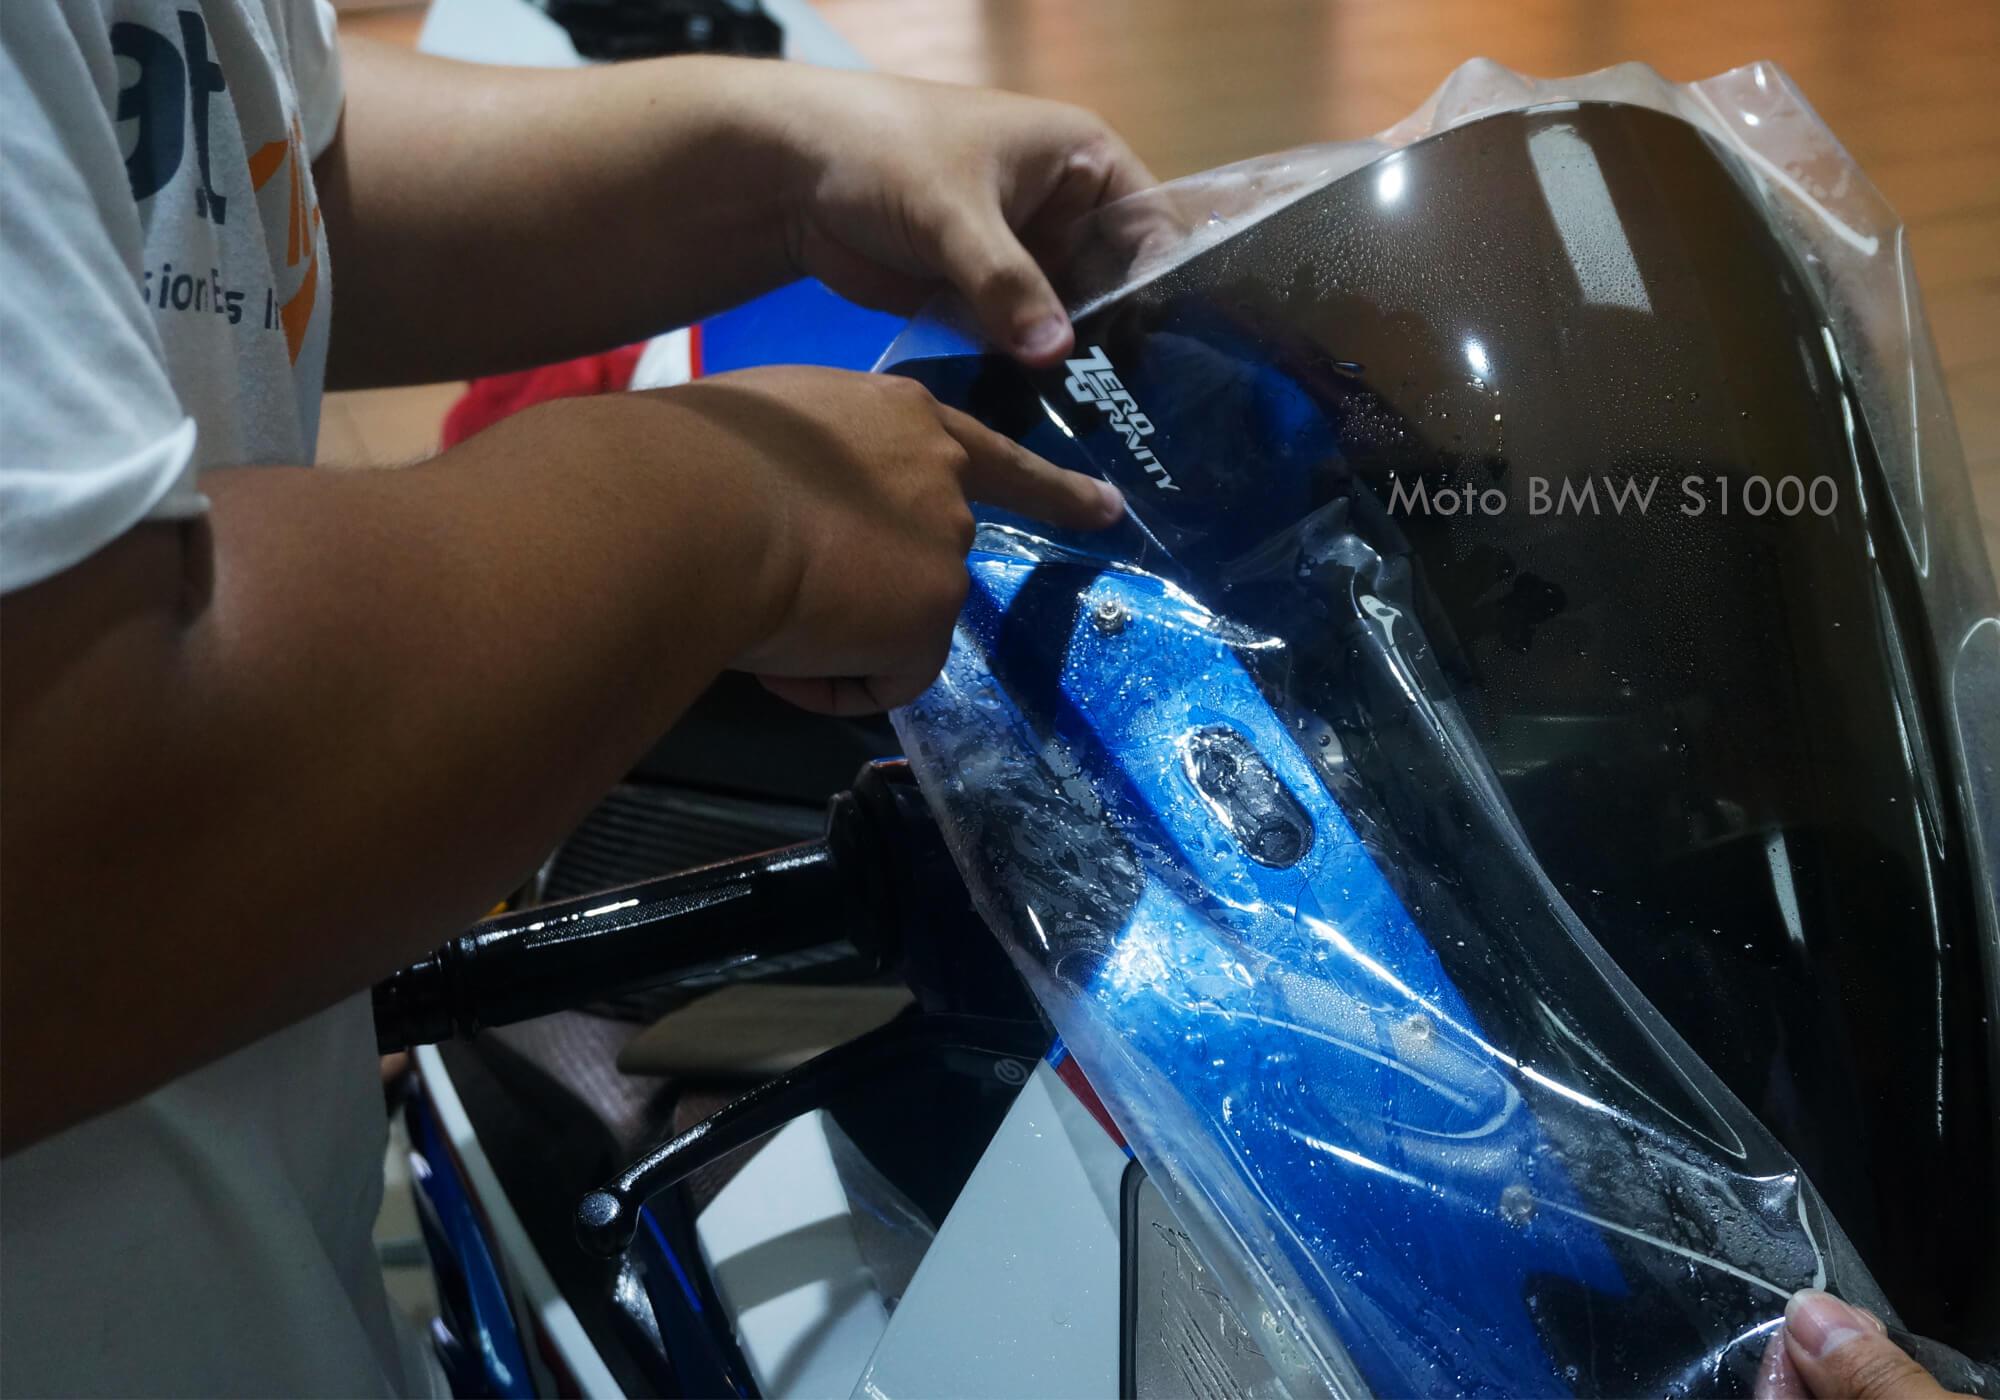 Moto BMW S1000